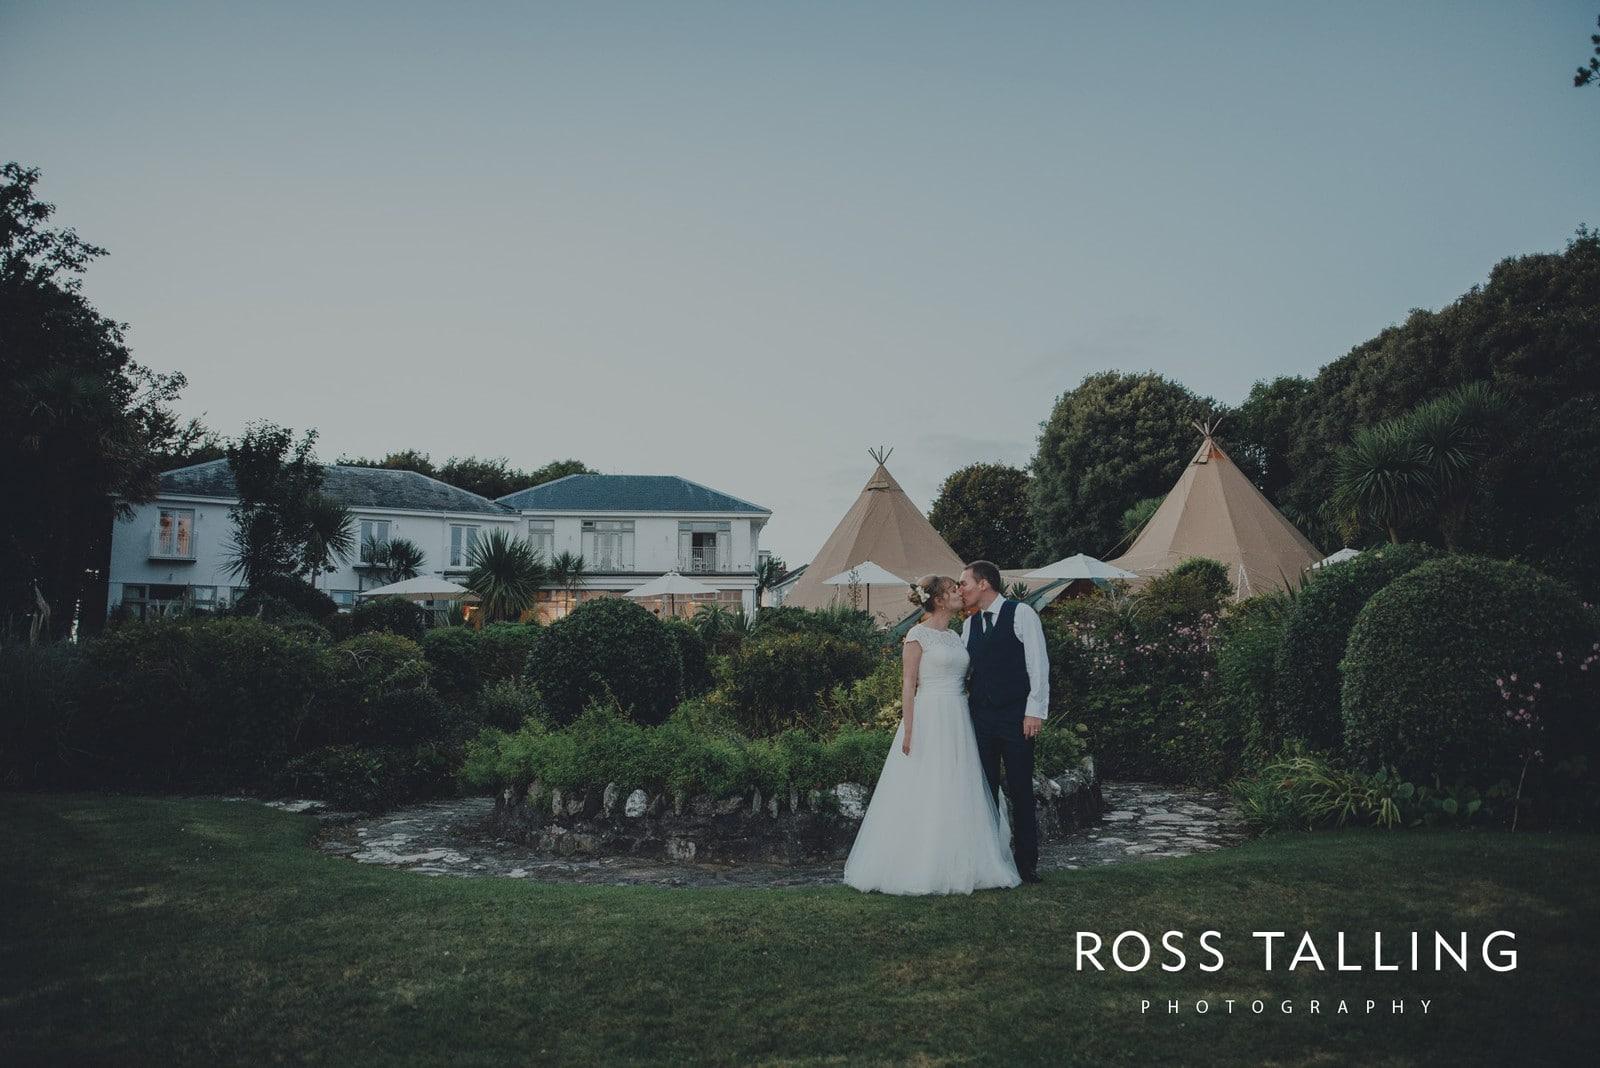 laura-matts-rosevine-hotel-wedding-photography-cornwall_0199